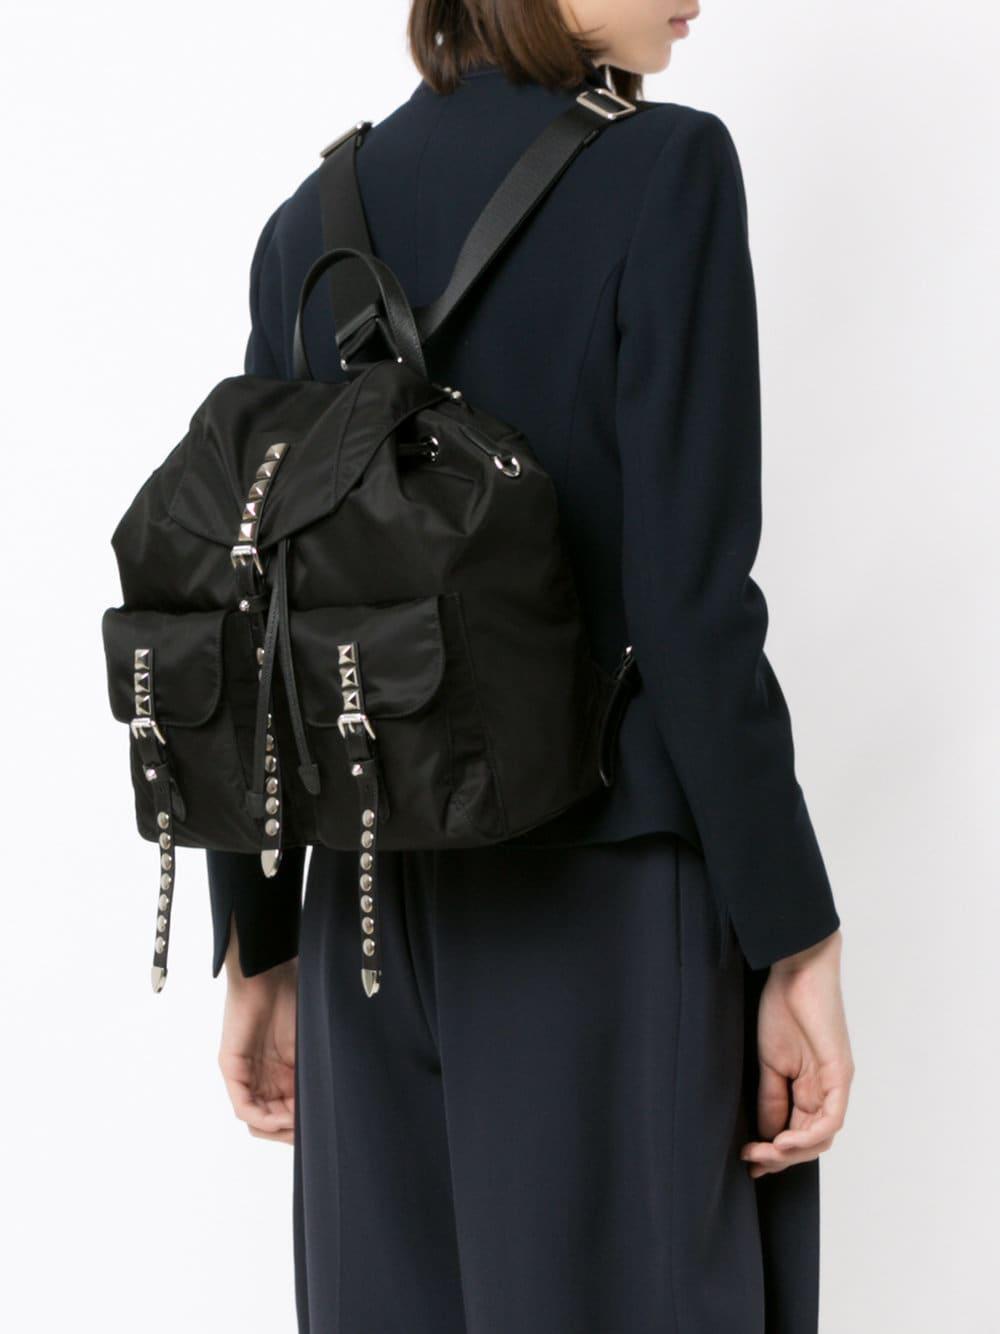 0283060031 Lyst - Prada Black Stud Embellished Nylon Backpack in Black